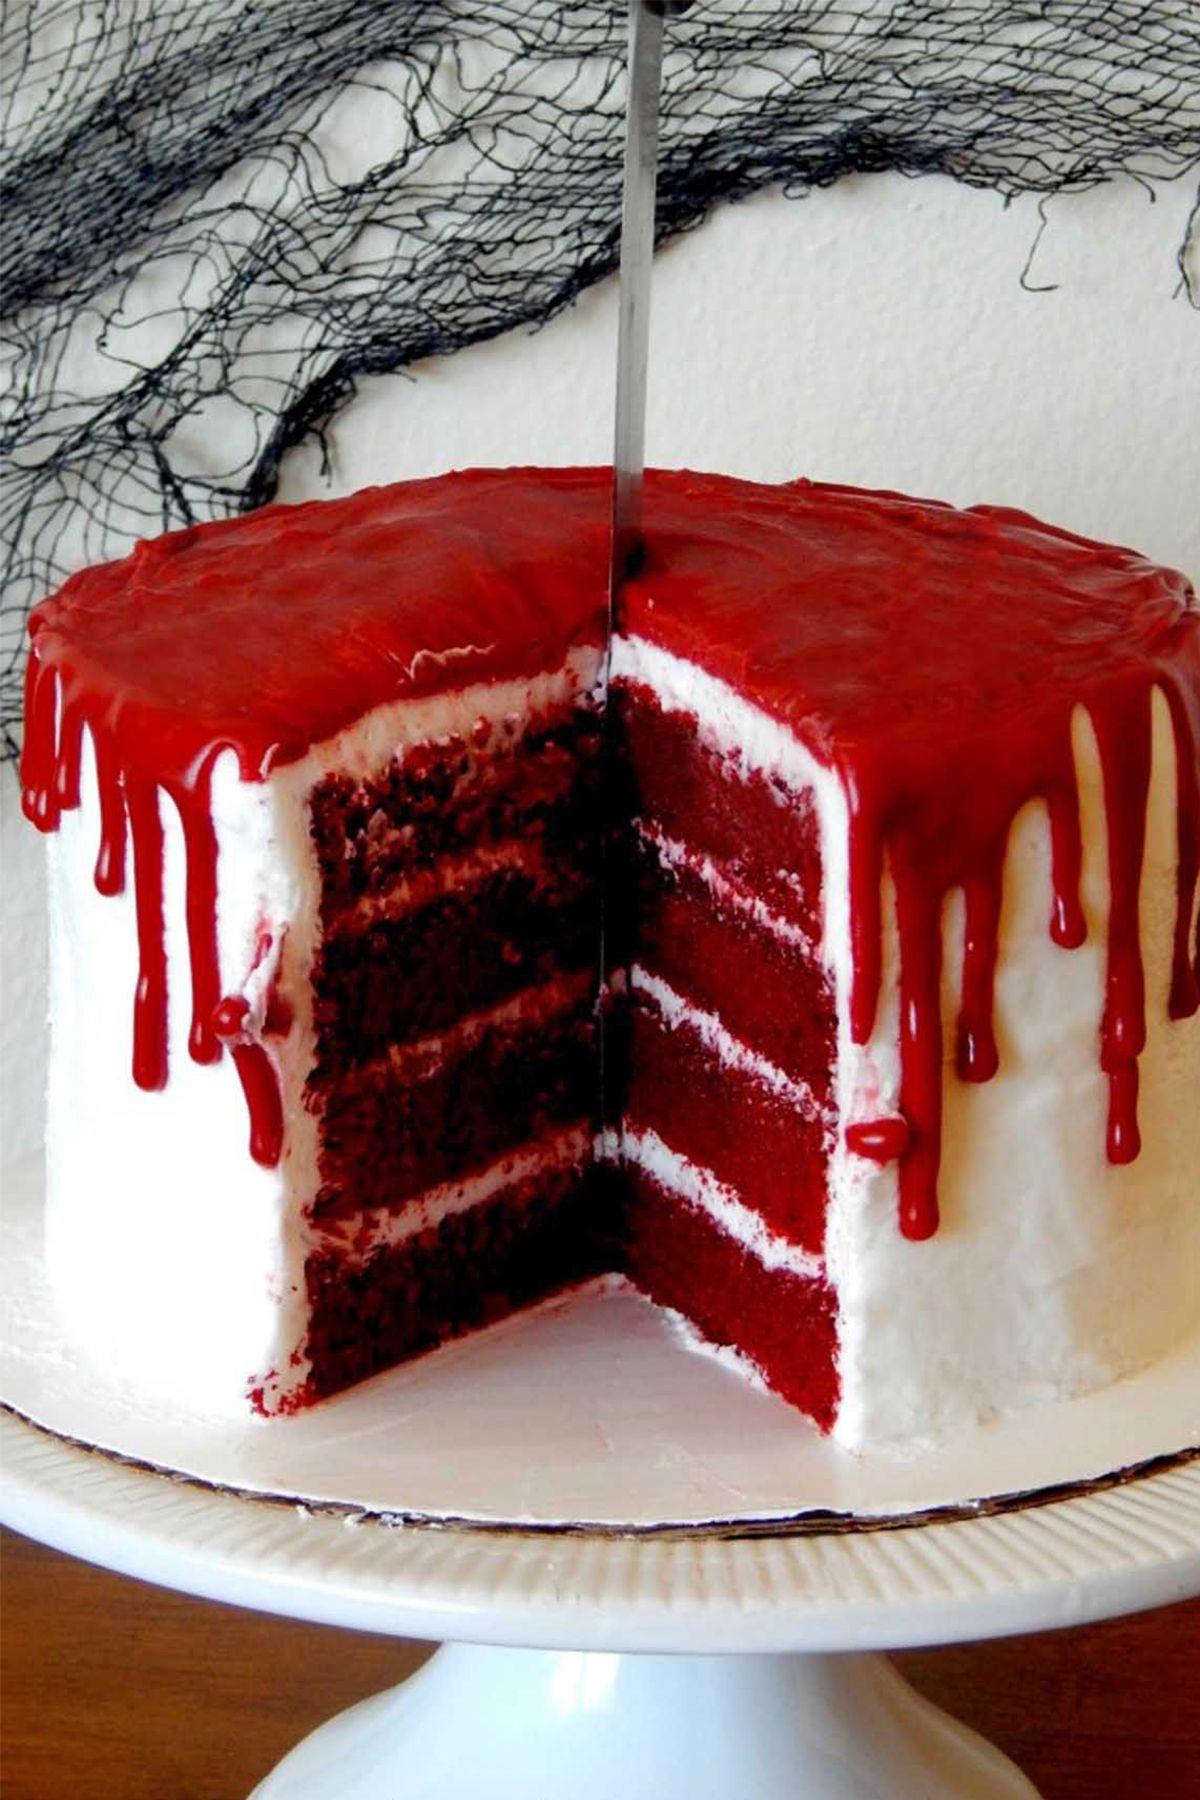 35 easy halloween cakes - recipes & ideas for halloween cake decorating